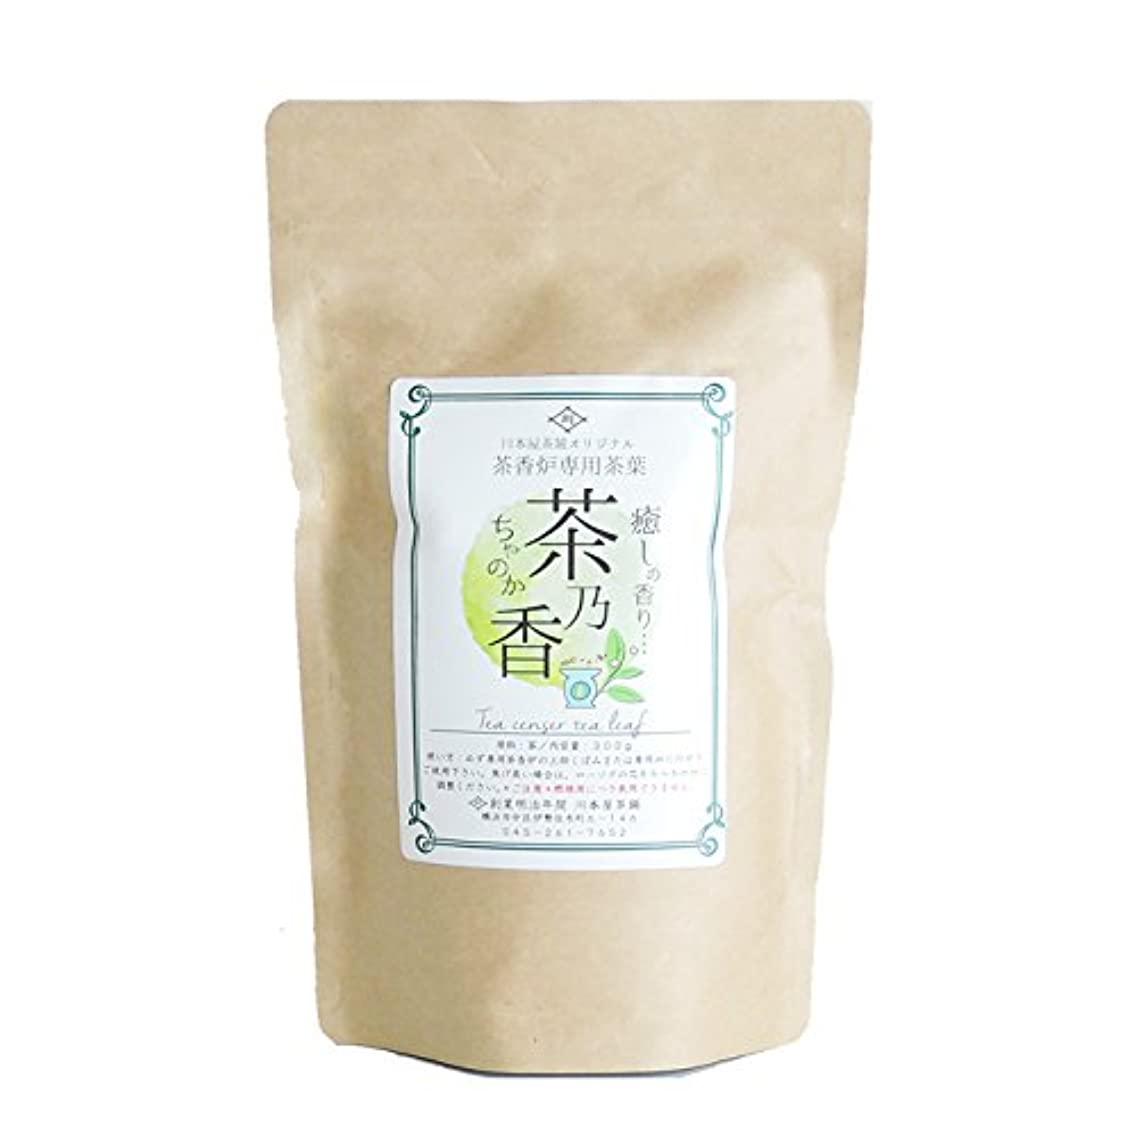 偽造縮れた薄暗い国産 茶香炉専用 茶葉 「茶乃香」300g 川本屋茶舗